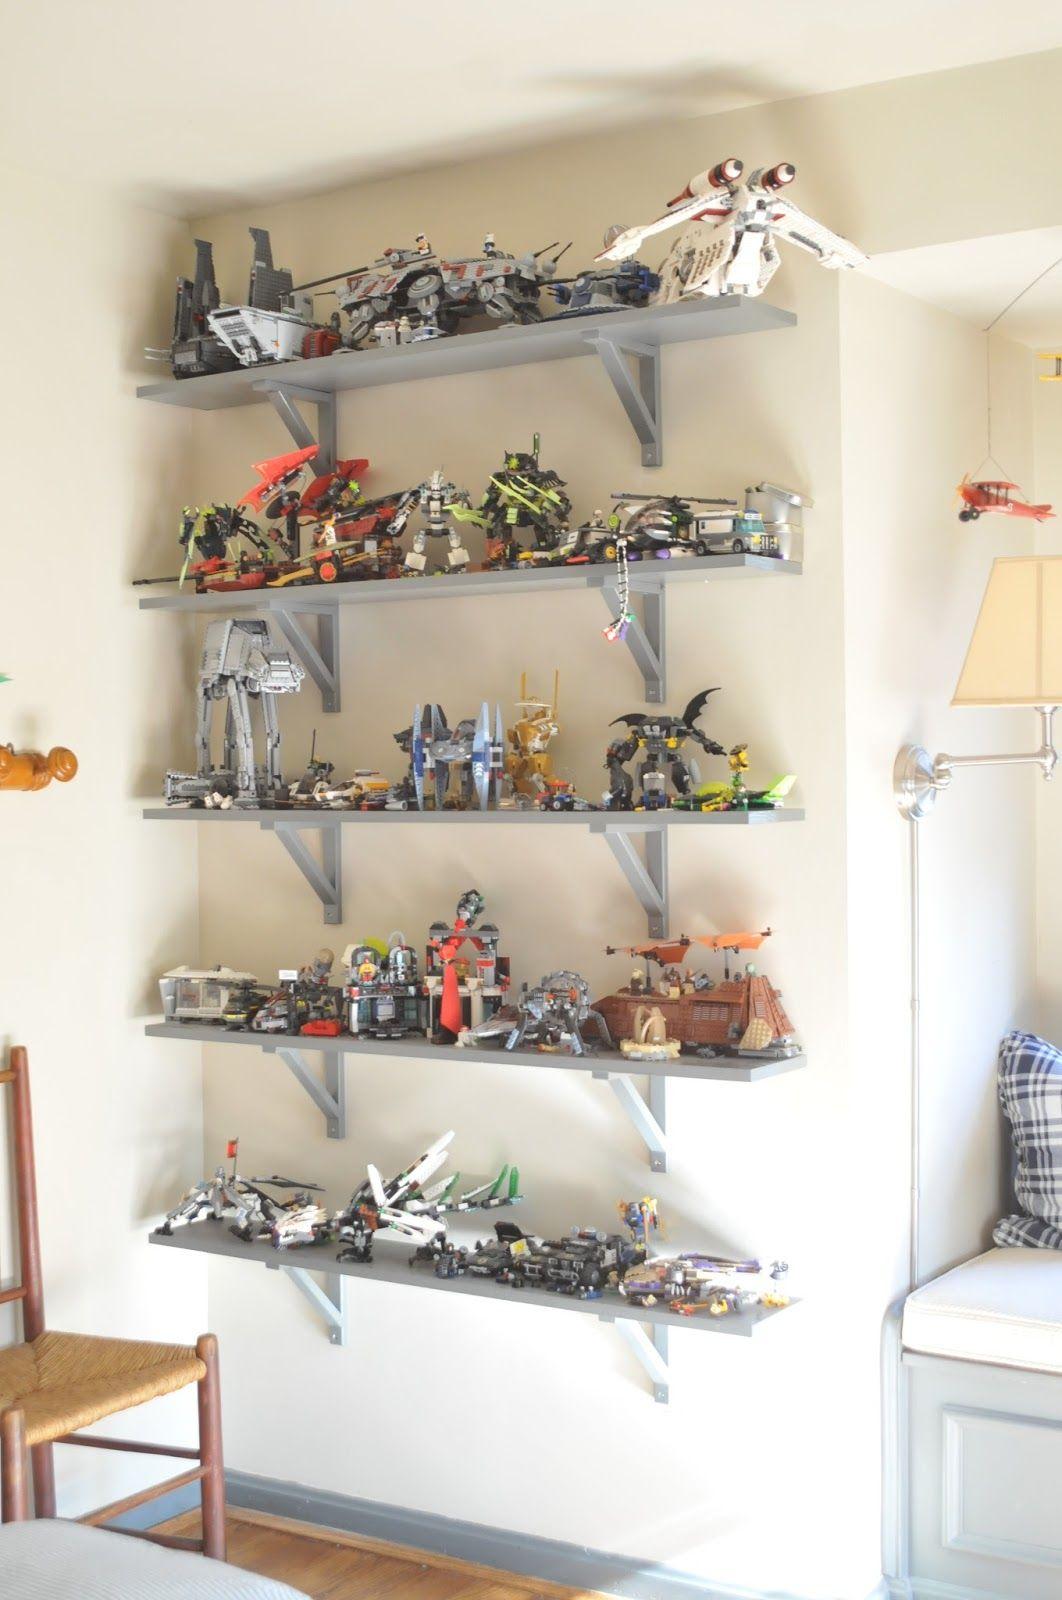 our home  shelves in bedroom lego room wall shelves design